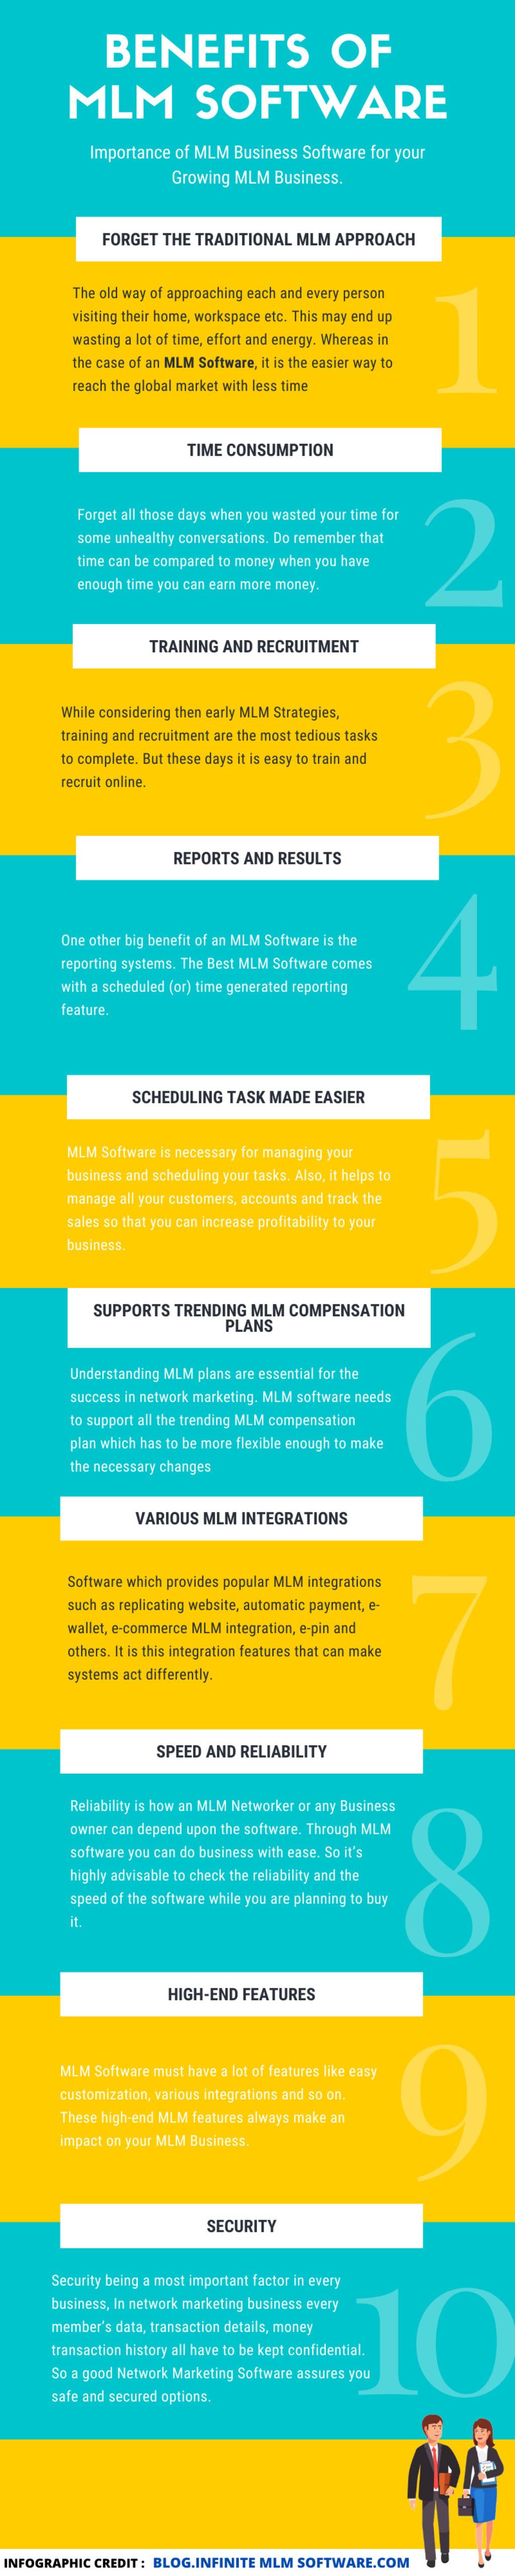 Benefits of MLM Software via Infinite MLM Software